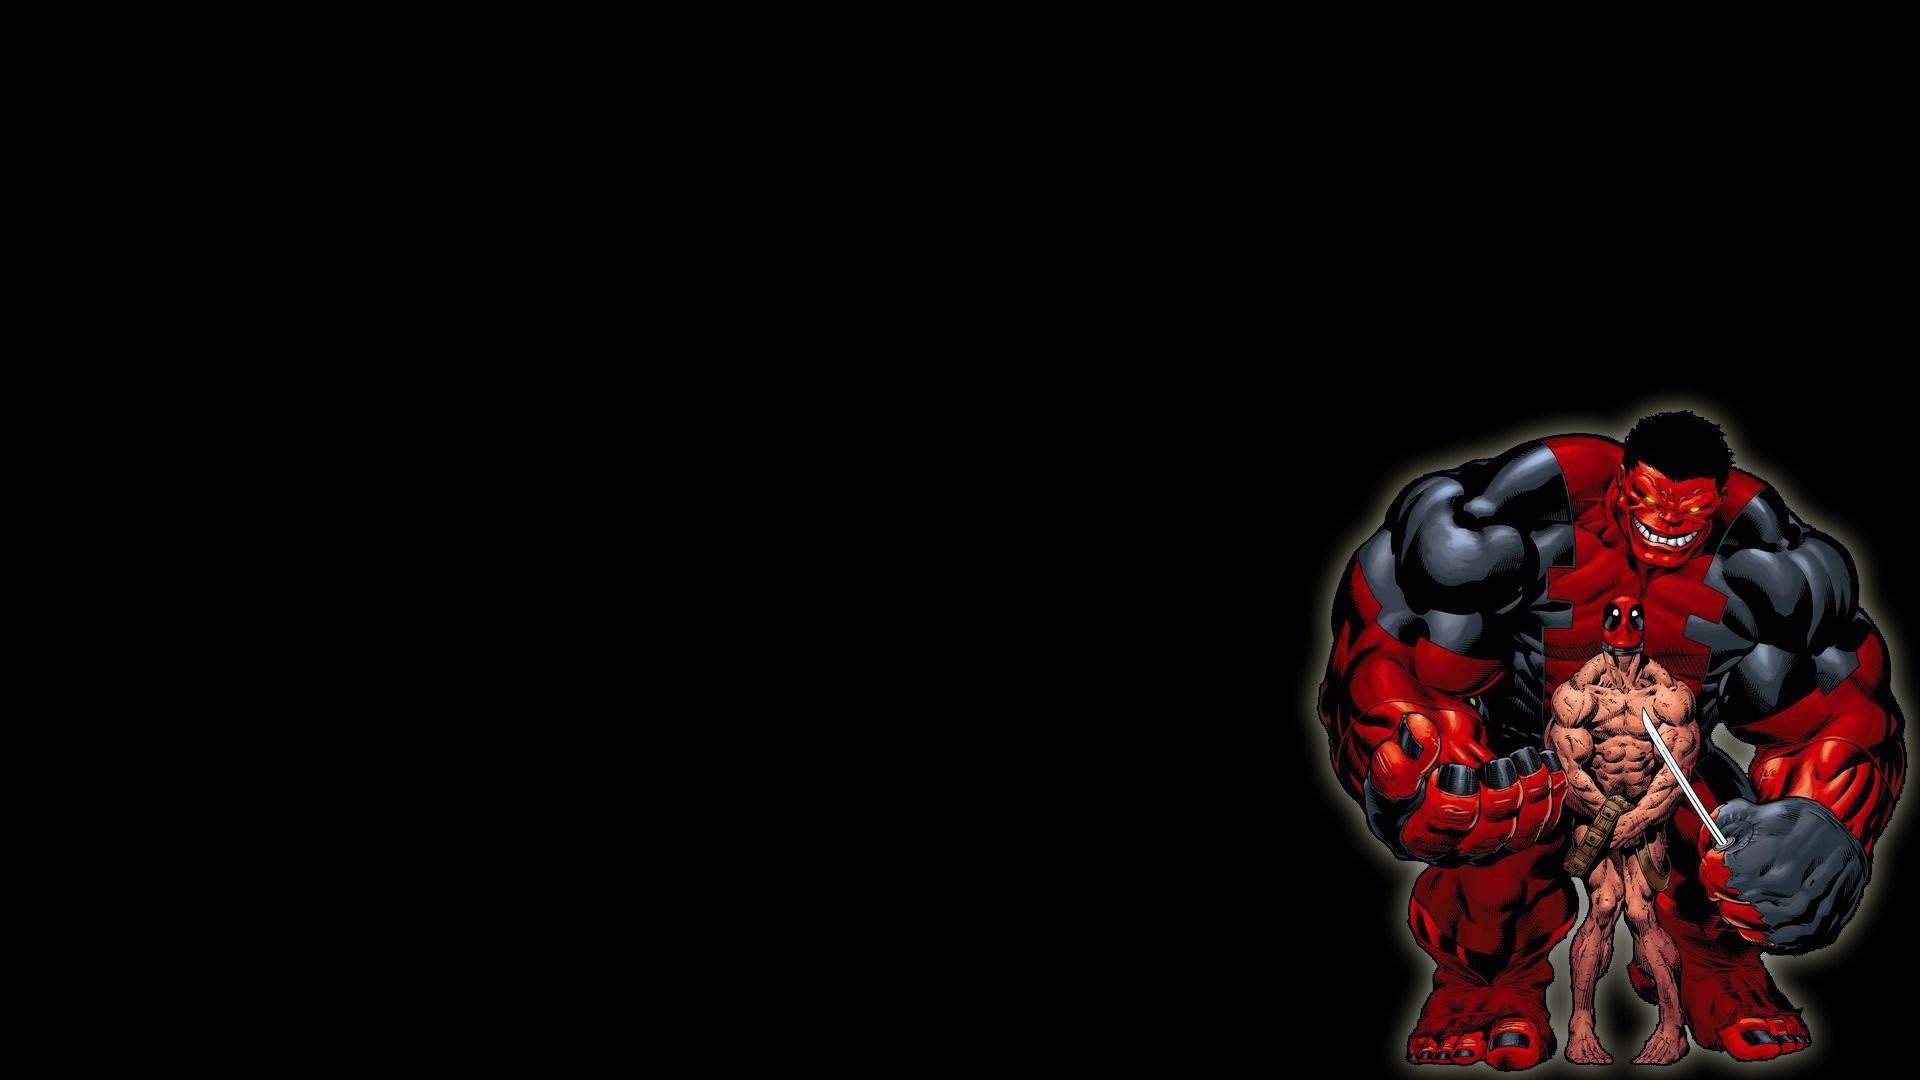 Deadpool Spiderman Wallpapers Phone …